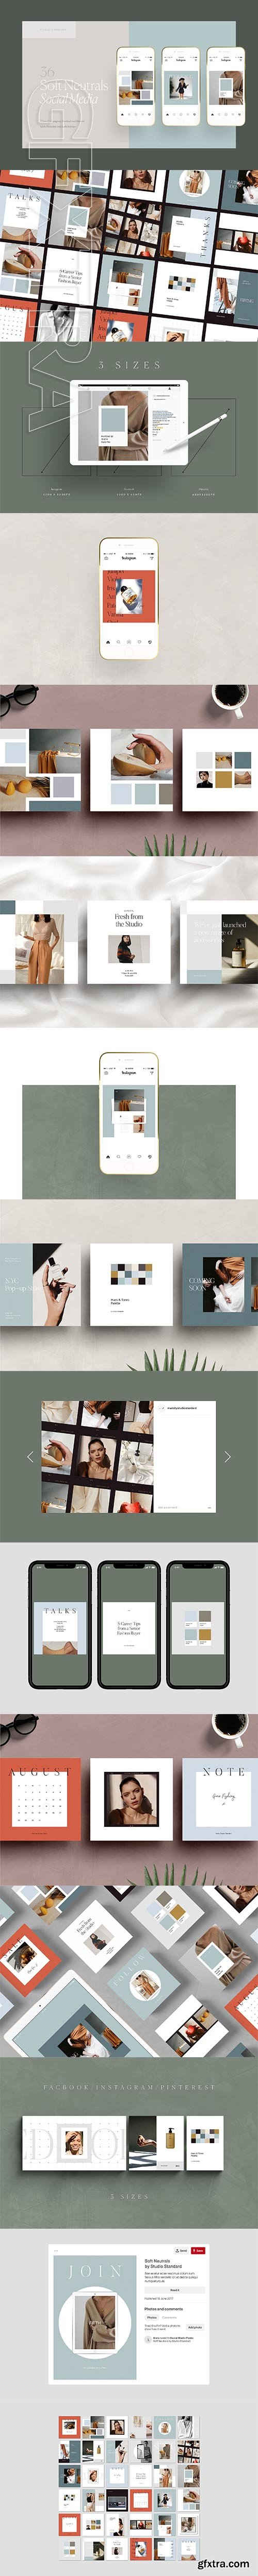 CreativeMarket - SOFT NEUTRALS - Social Media Pack 2568313